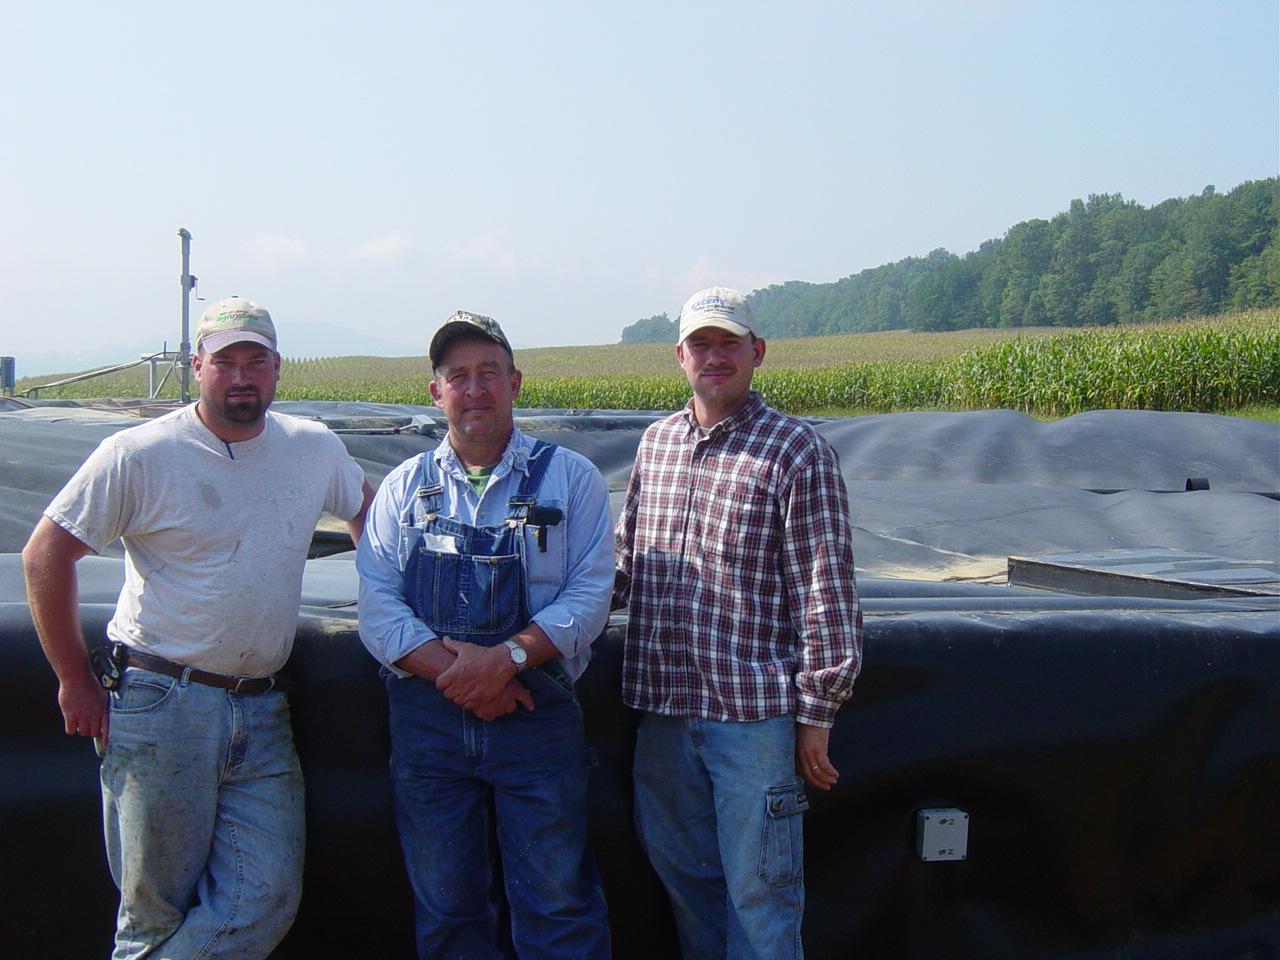 Penn England Farm.   Ben Postles, Fred England & Dan McMonagle